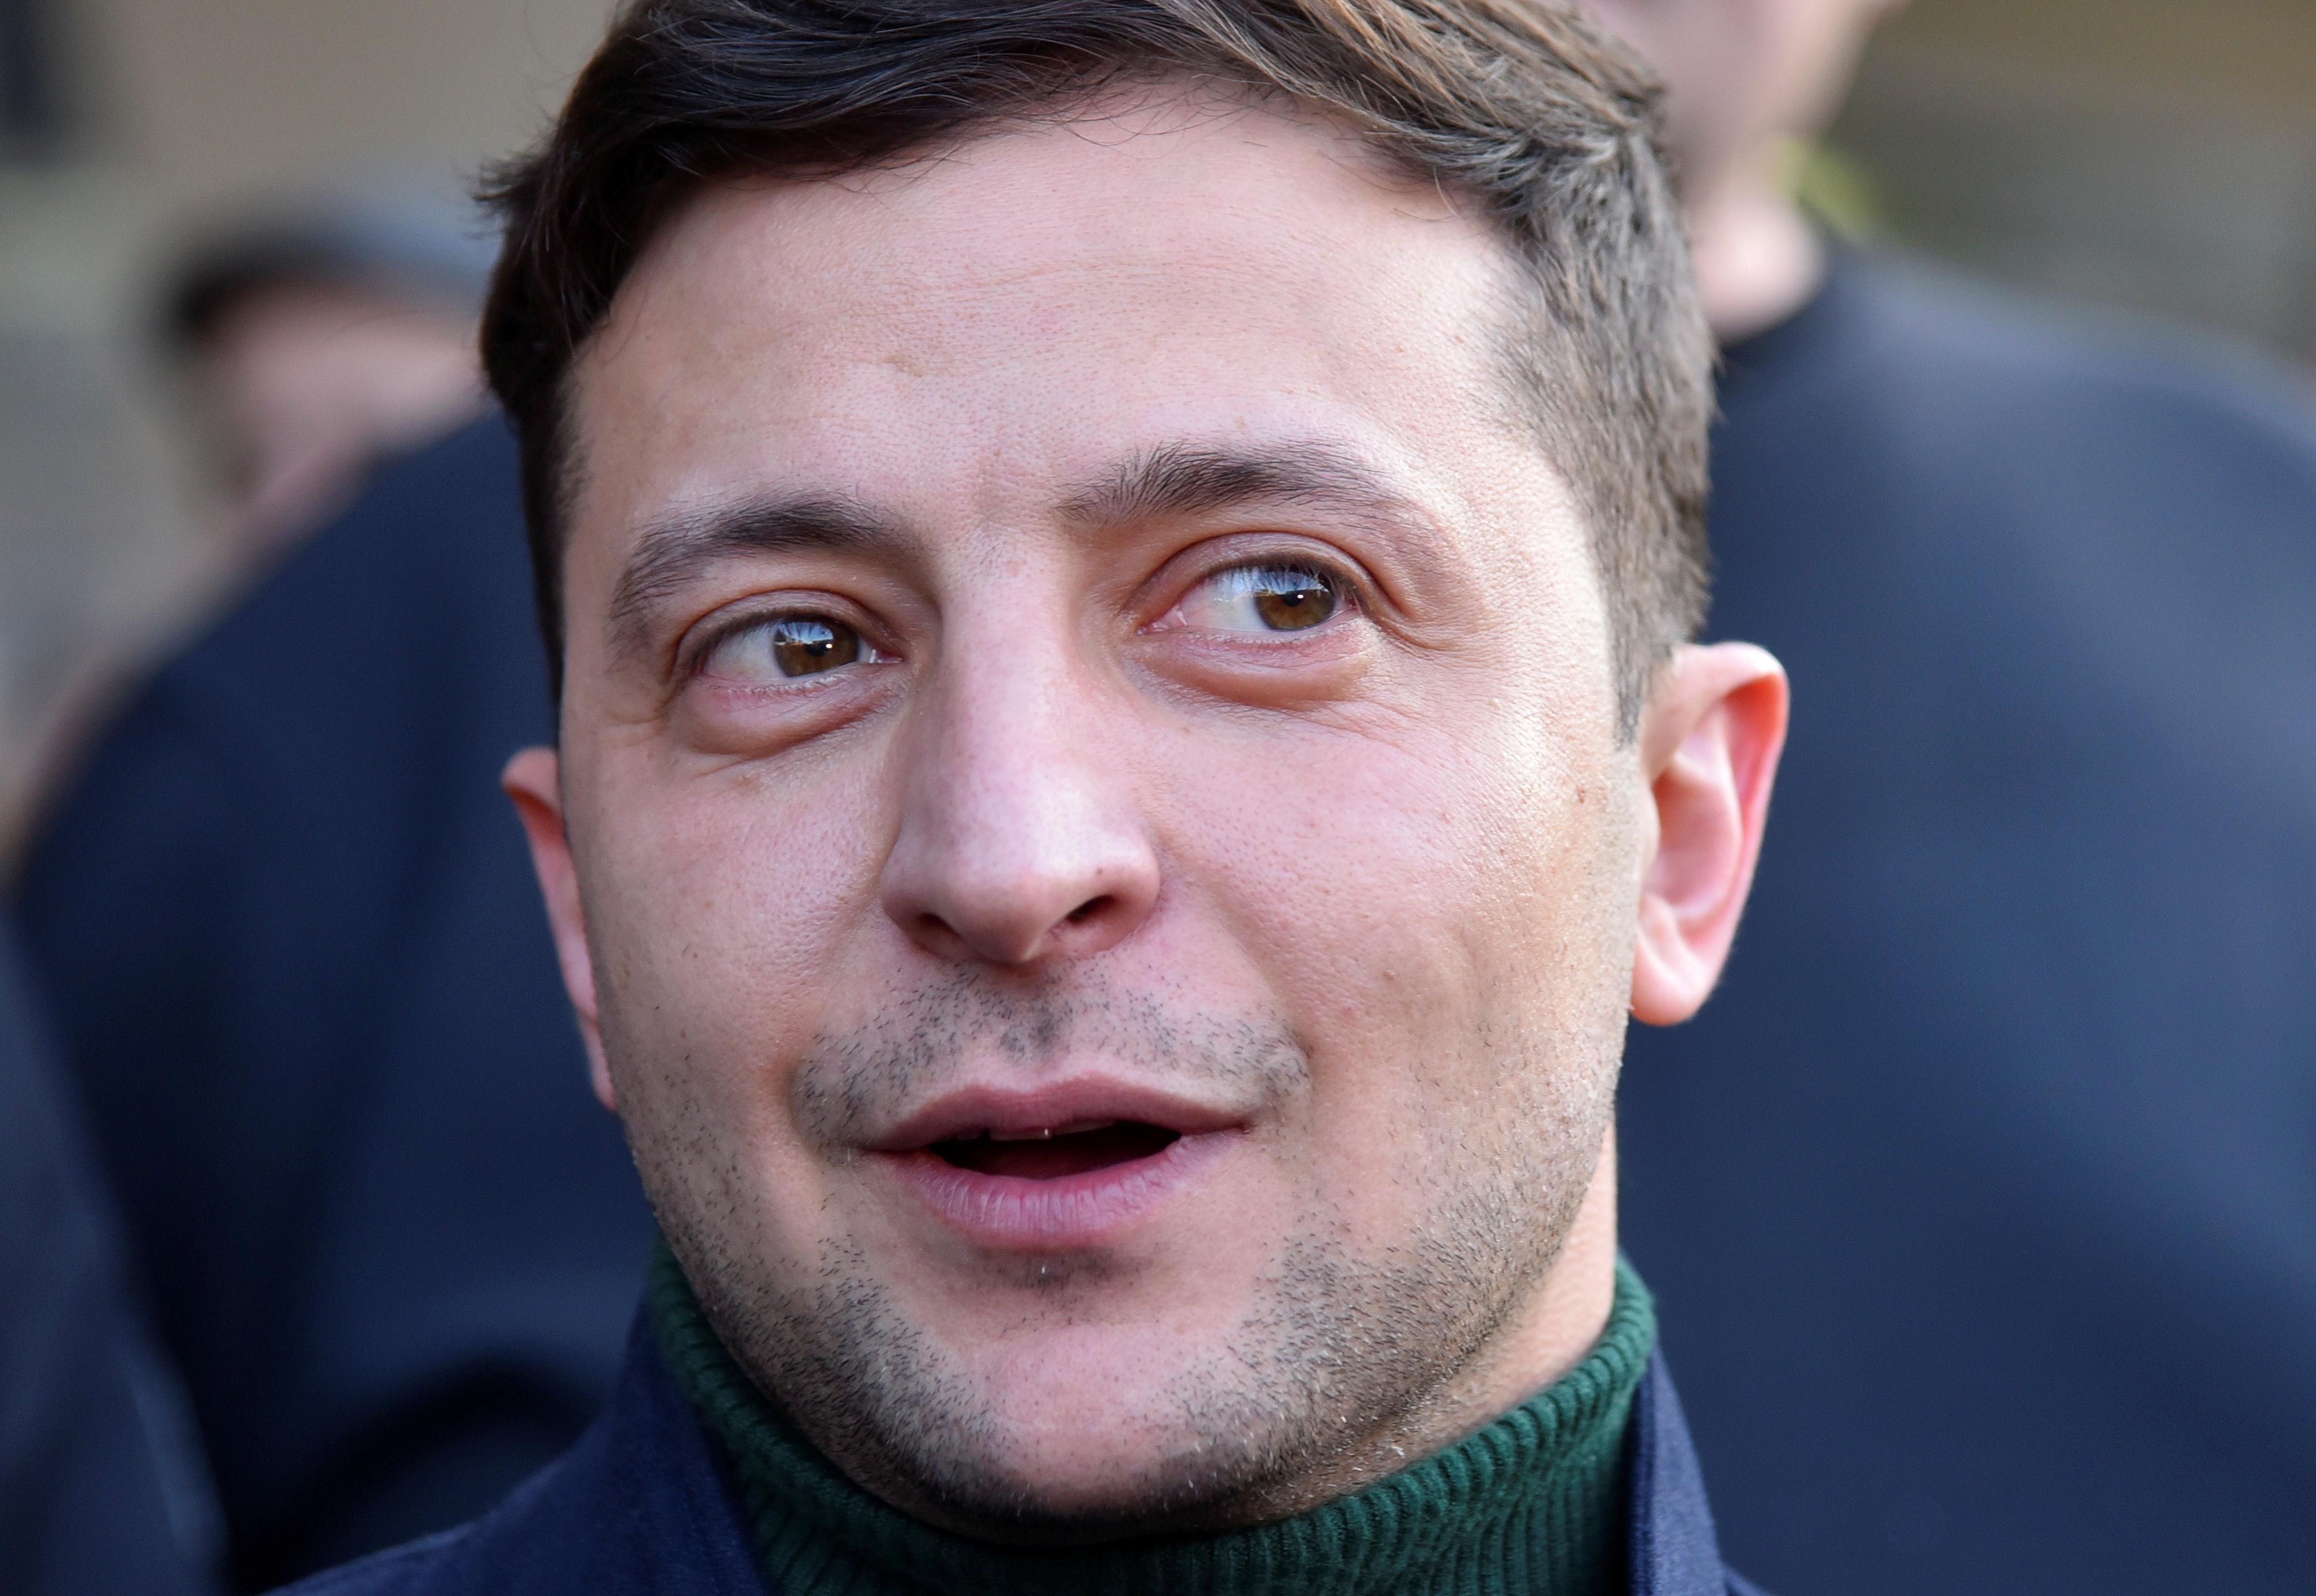 Volodymyr Zelenskiy, Ukrainian actor, leads latest polls for Ukraine's presidential race. February 8, 2019. REUTERS/Mykola Tys